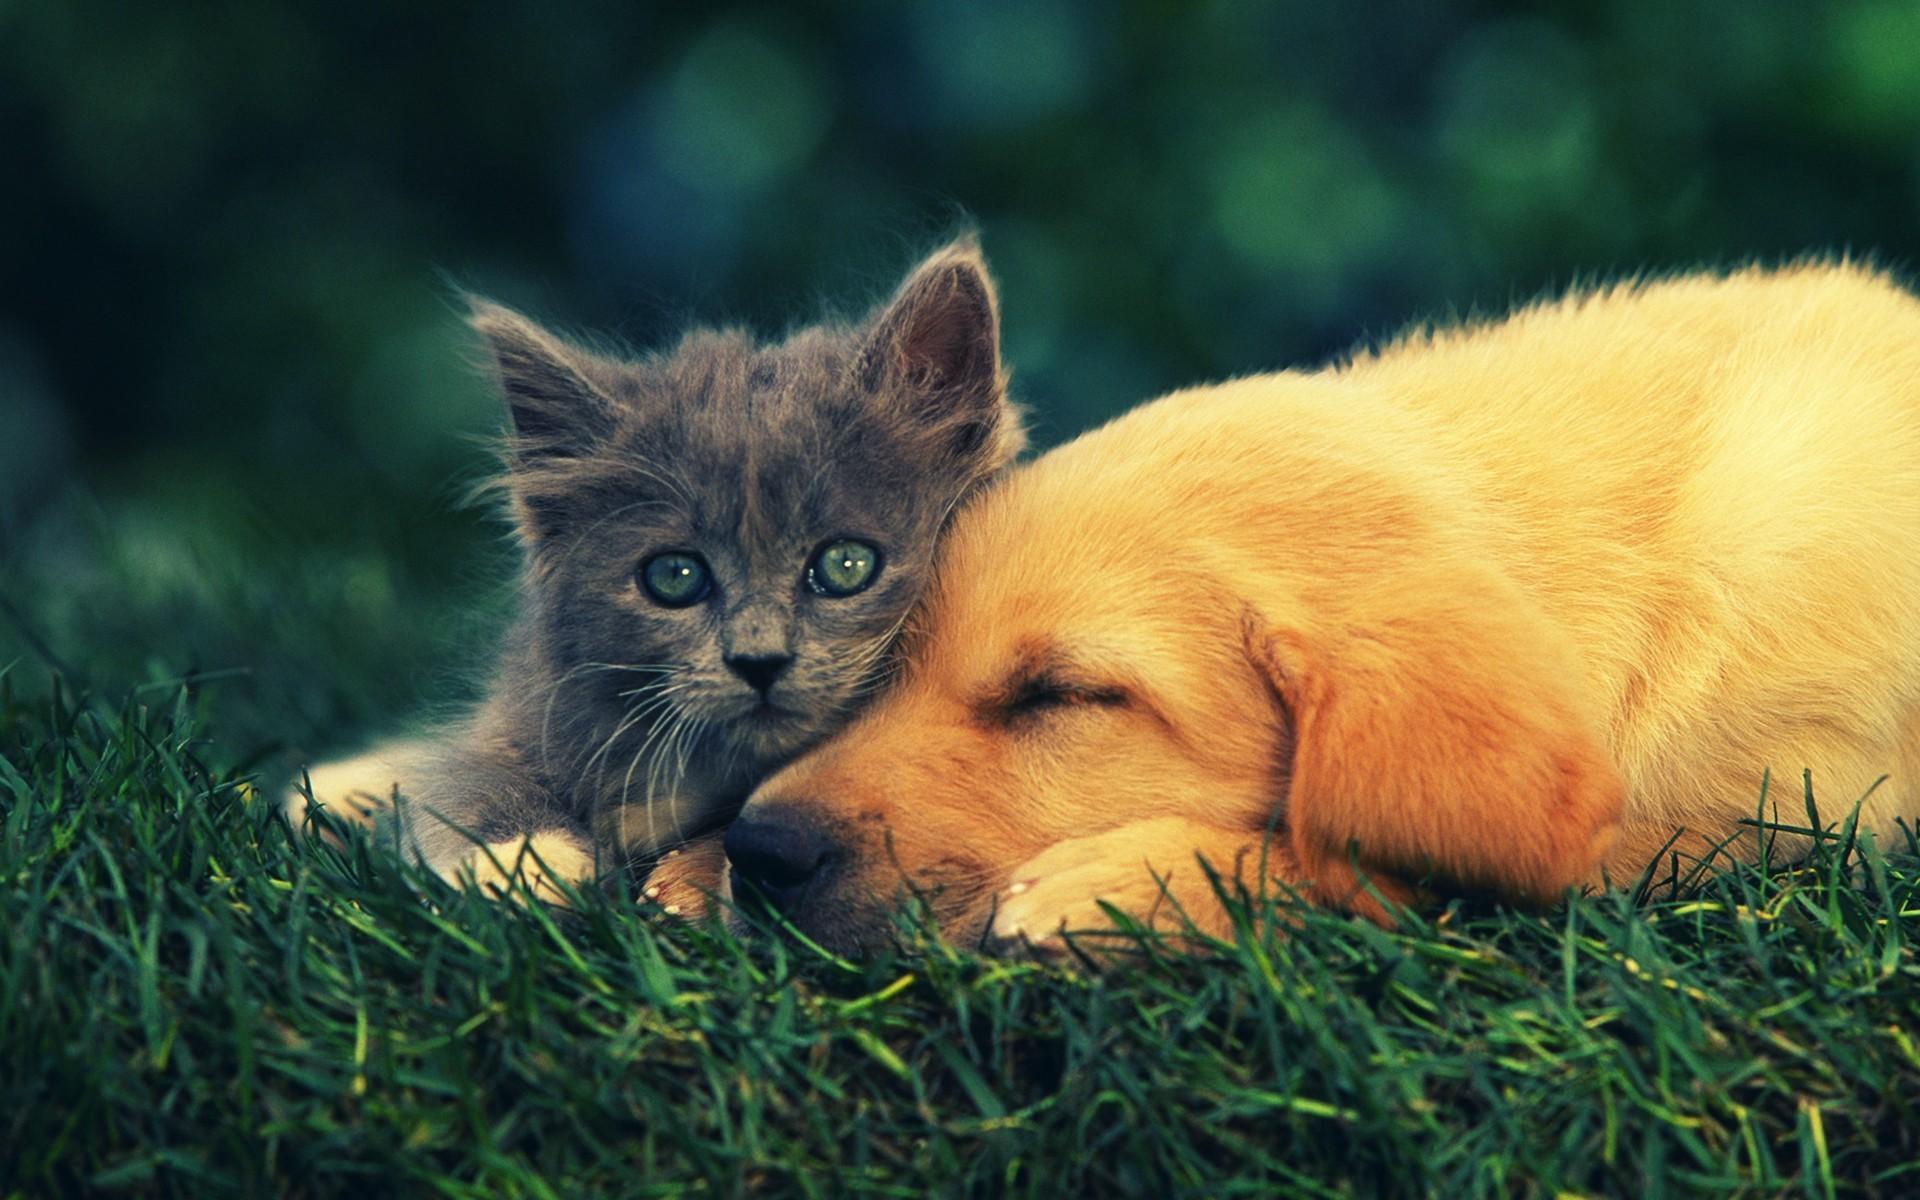 Animal Cat Kitten Animal Wallpaper | Tierbabys, Tierkinder, Wallpapers  Tiere, Animals Wallpapers | Pinterest | Cat photography, Animal wallpaper  and Cat